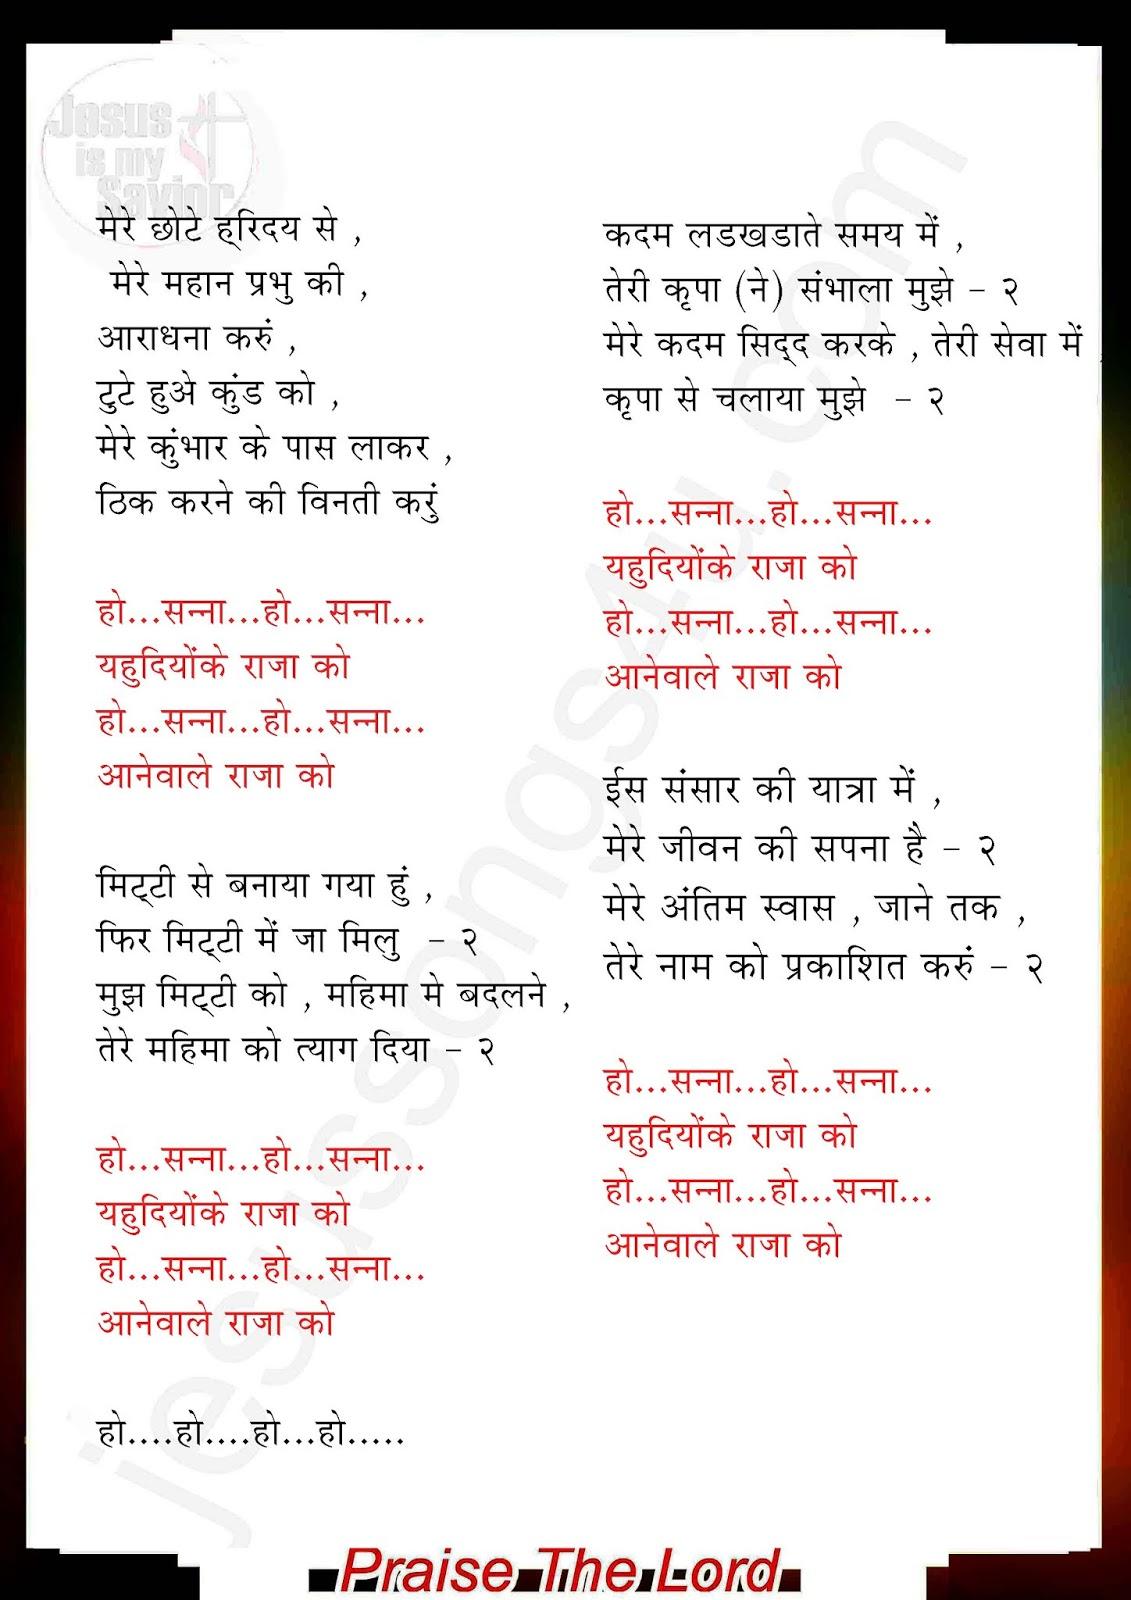 jesus christ hindi song download